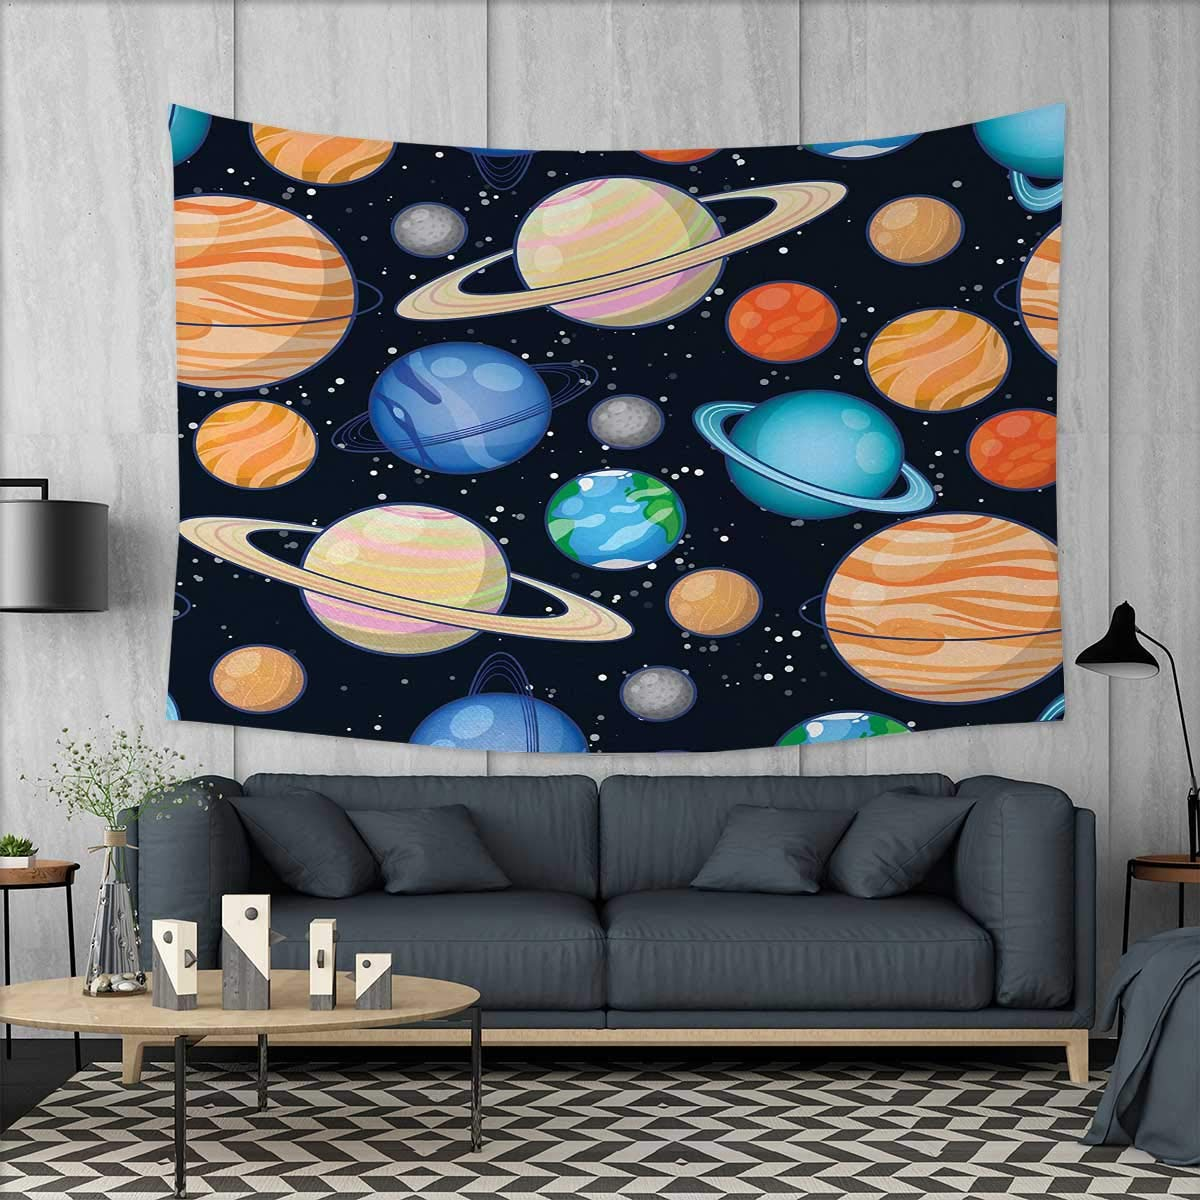 Anniutwo Galaxy Dorm Decor Cute Galaxy Space Art Solar System Planets Mars Mercury Uranus Jupiter Venus Kids Print Tapestry Table Cover Bedspread Beach Towel W71 x L60 (inch) Multi